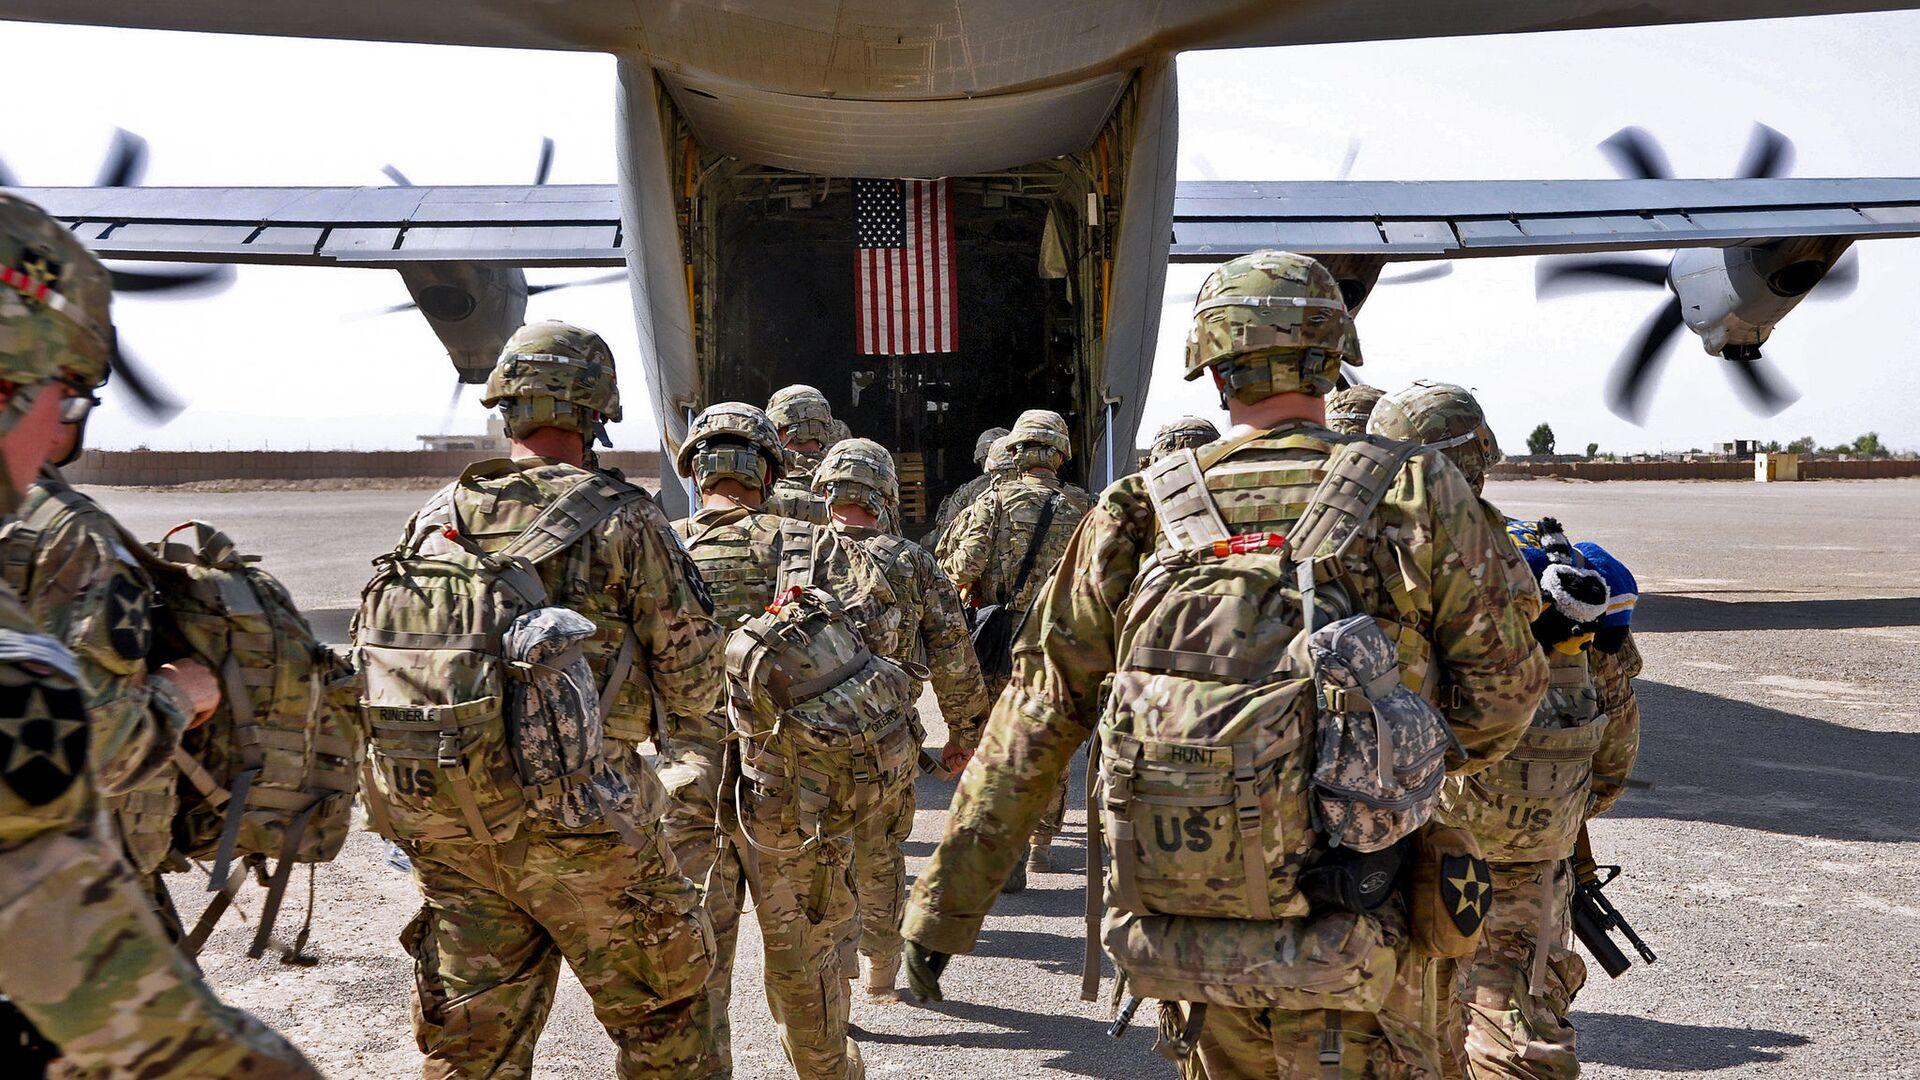 Američtí vojáci v Afghánistánu - Sputnik Česká republika, 1920, 17.05.2021